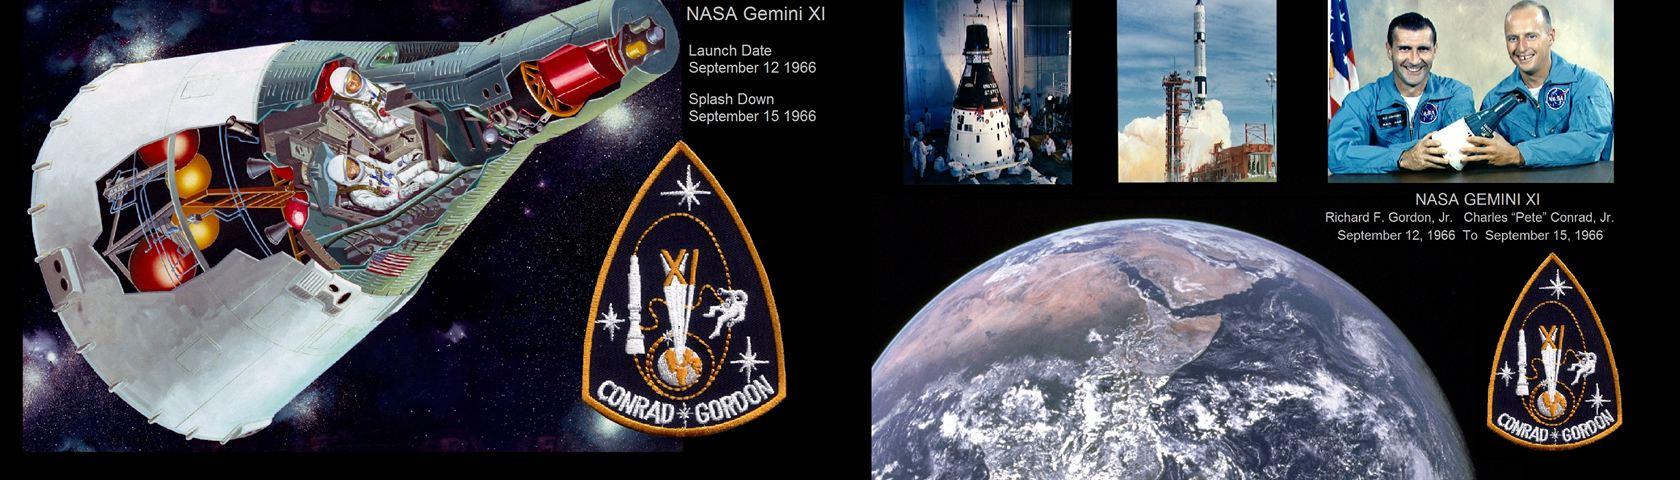 Gemini XI Tribute